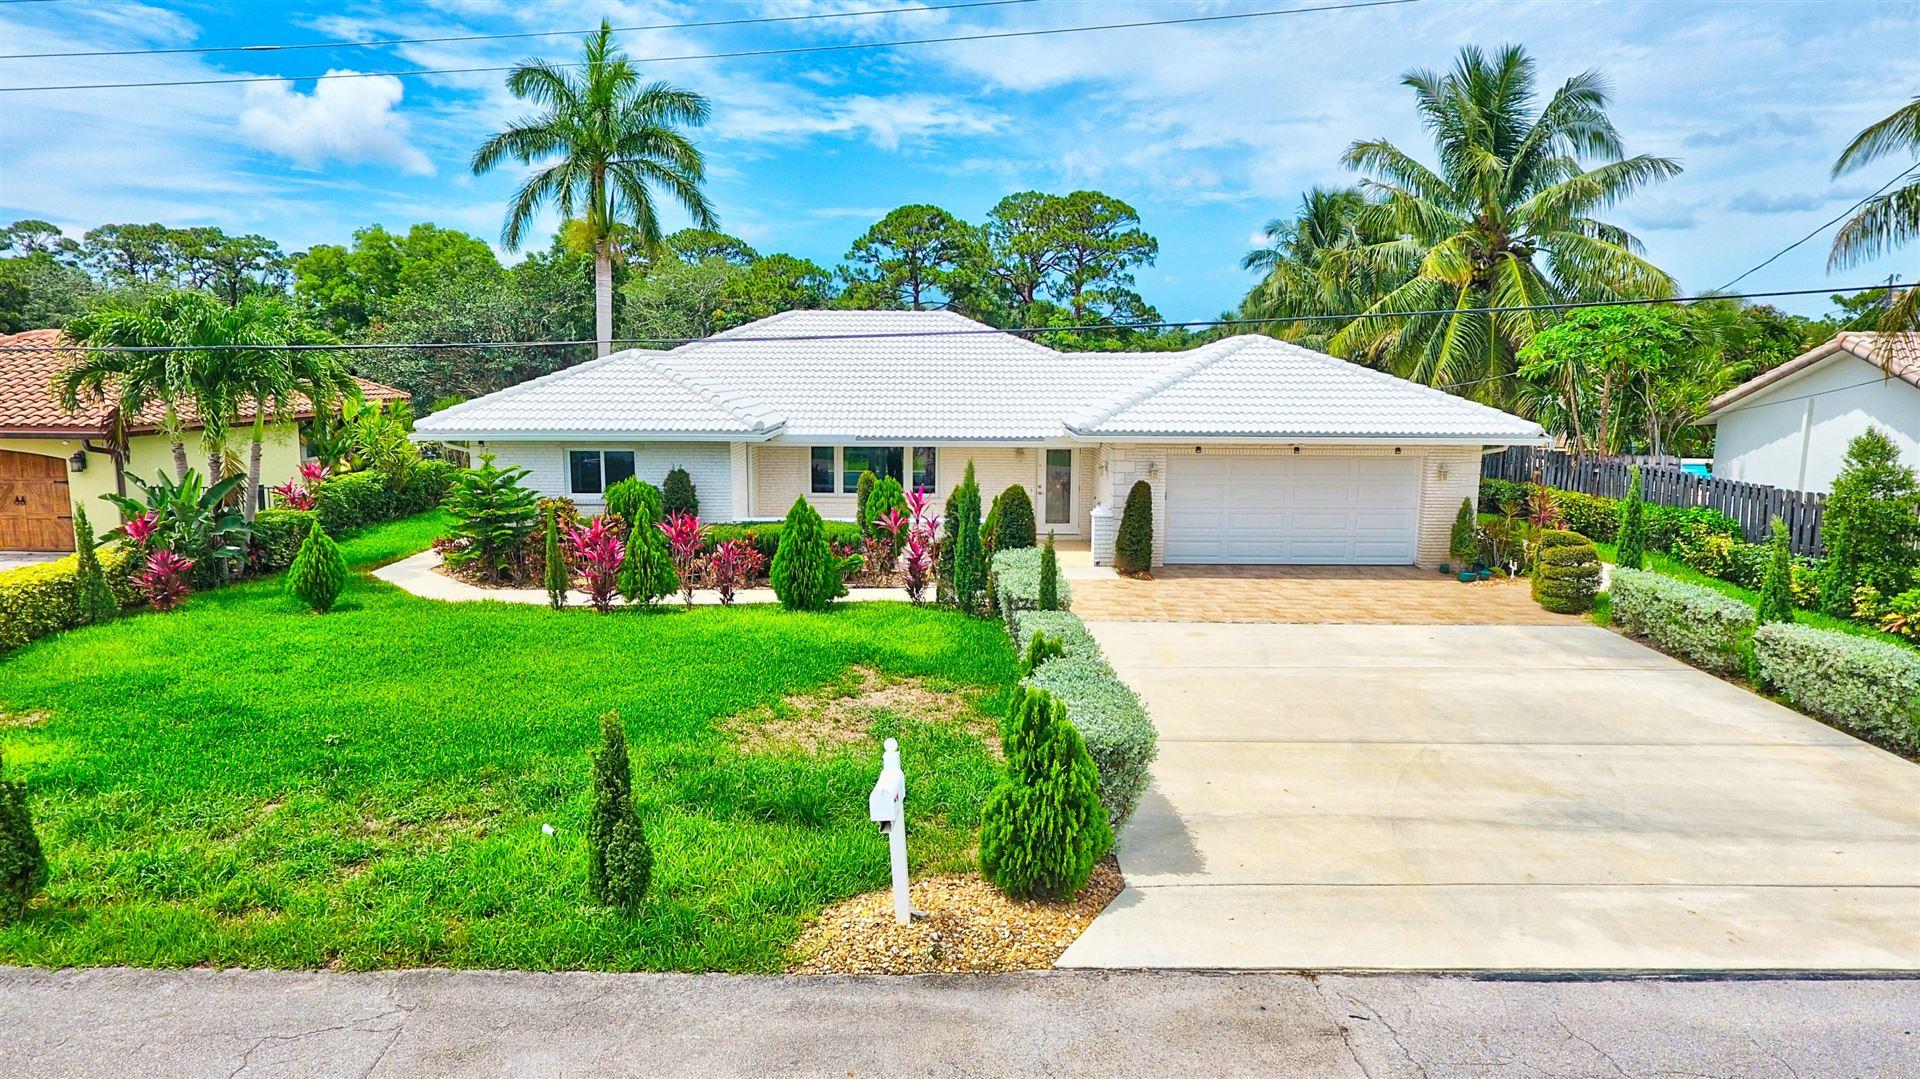 2036 Sharon Street, Boca Raton, FL 33428 - #: RX-10726483